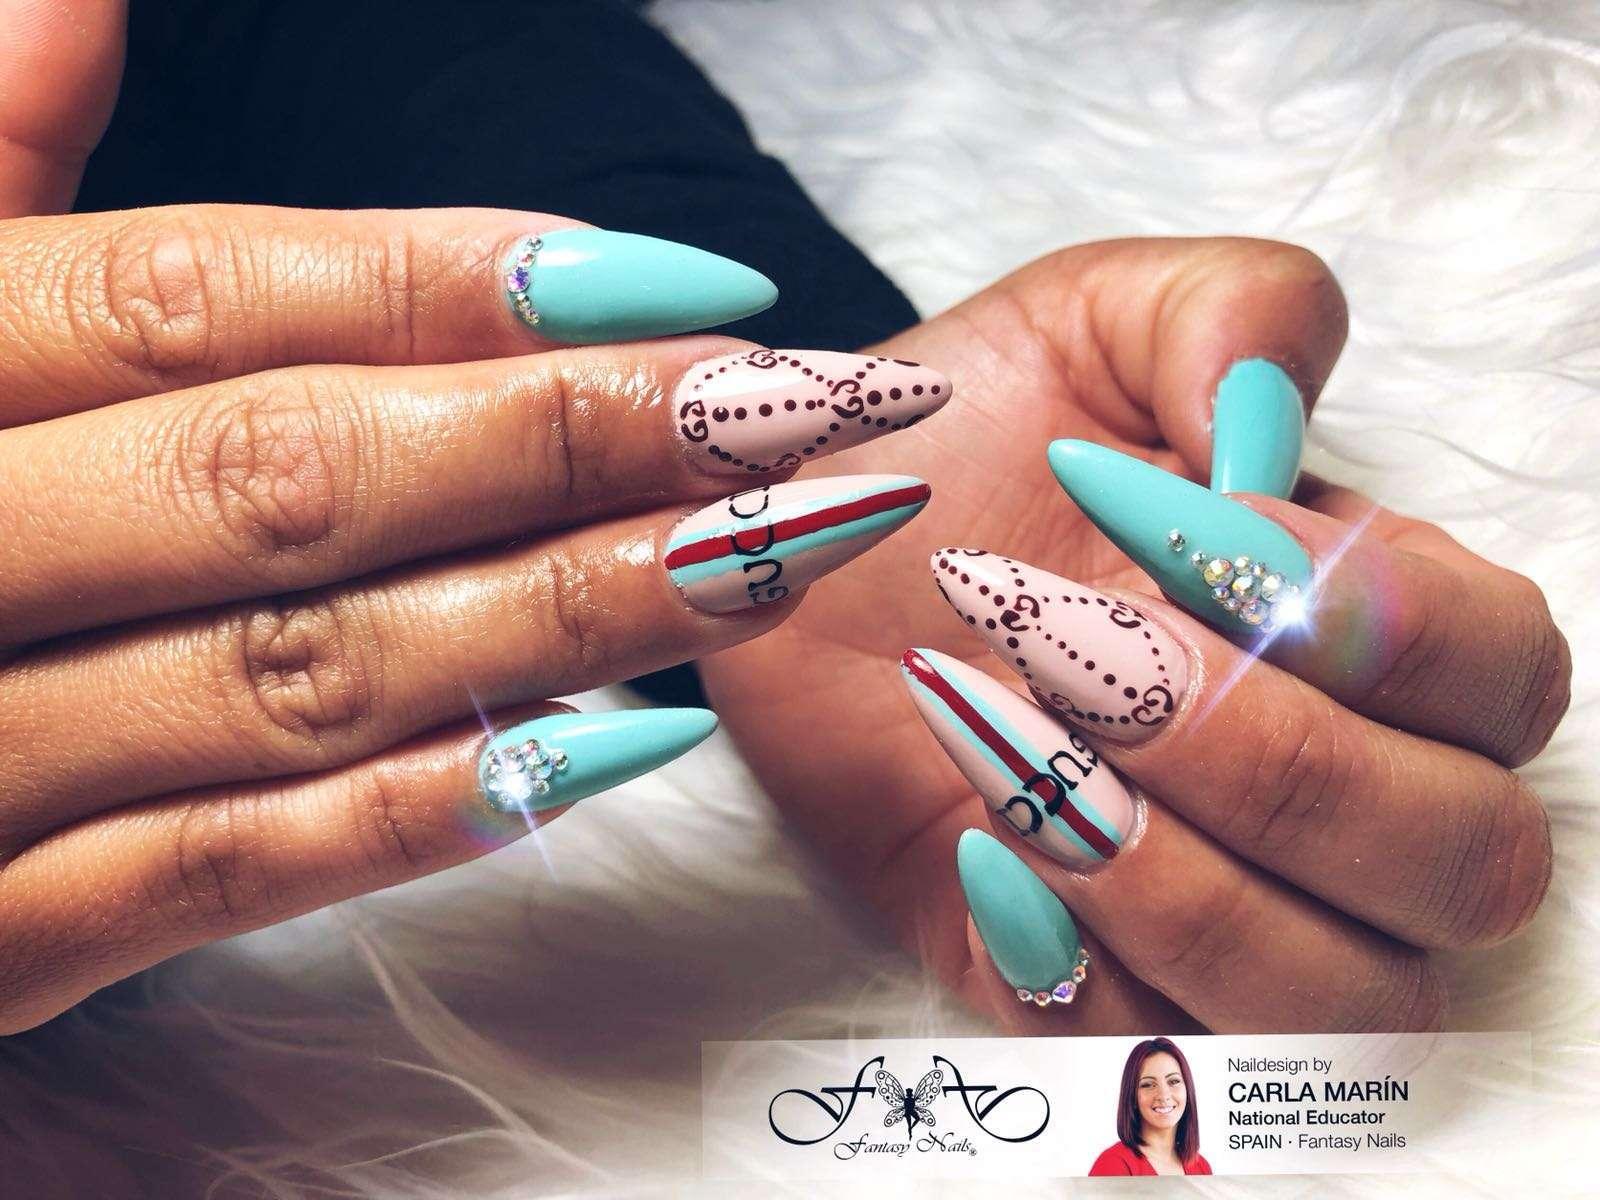 Nails design 1